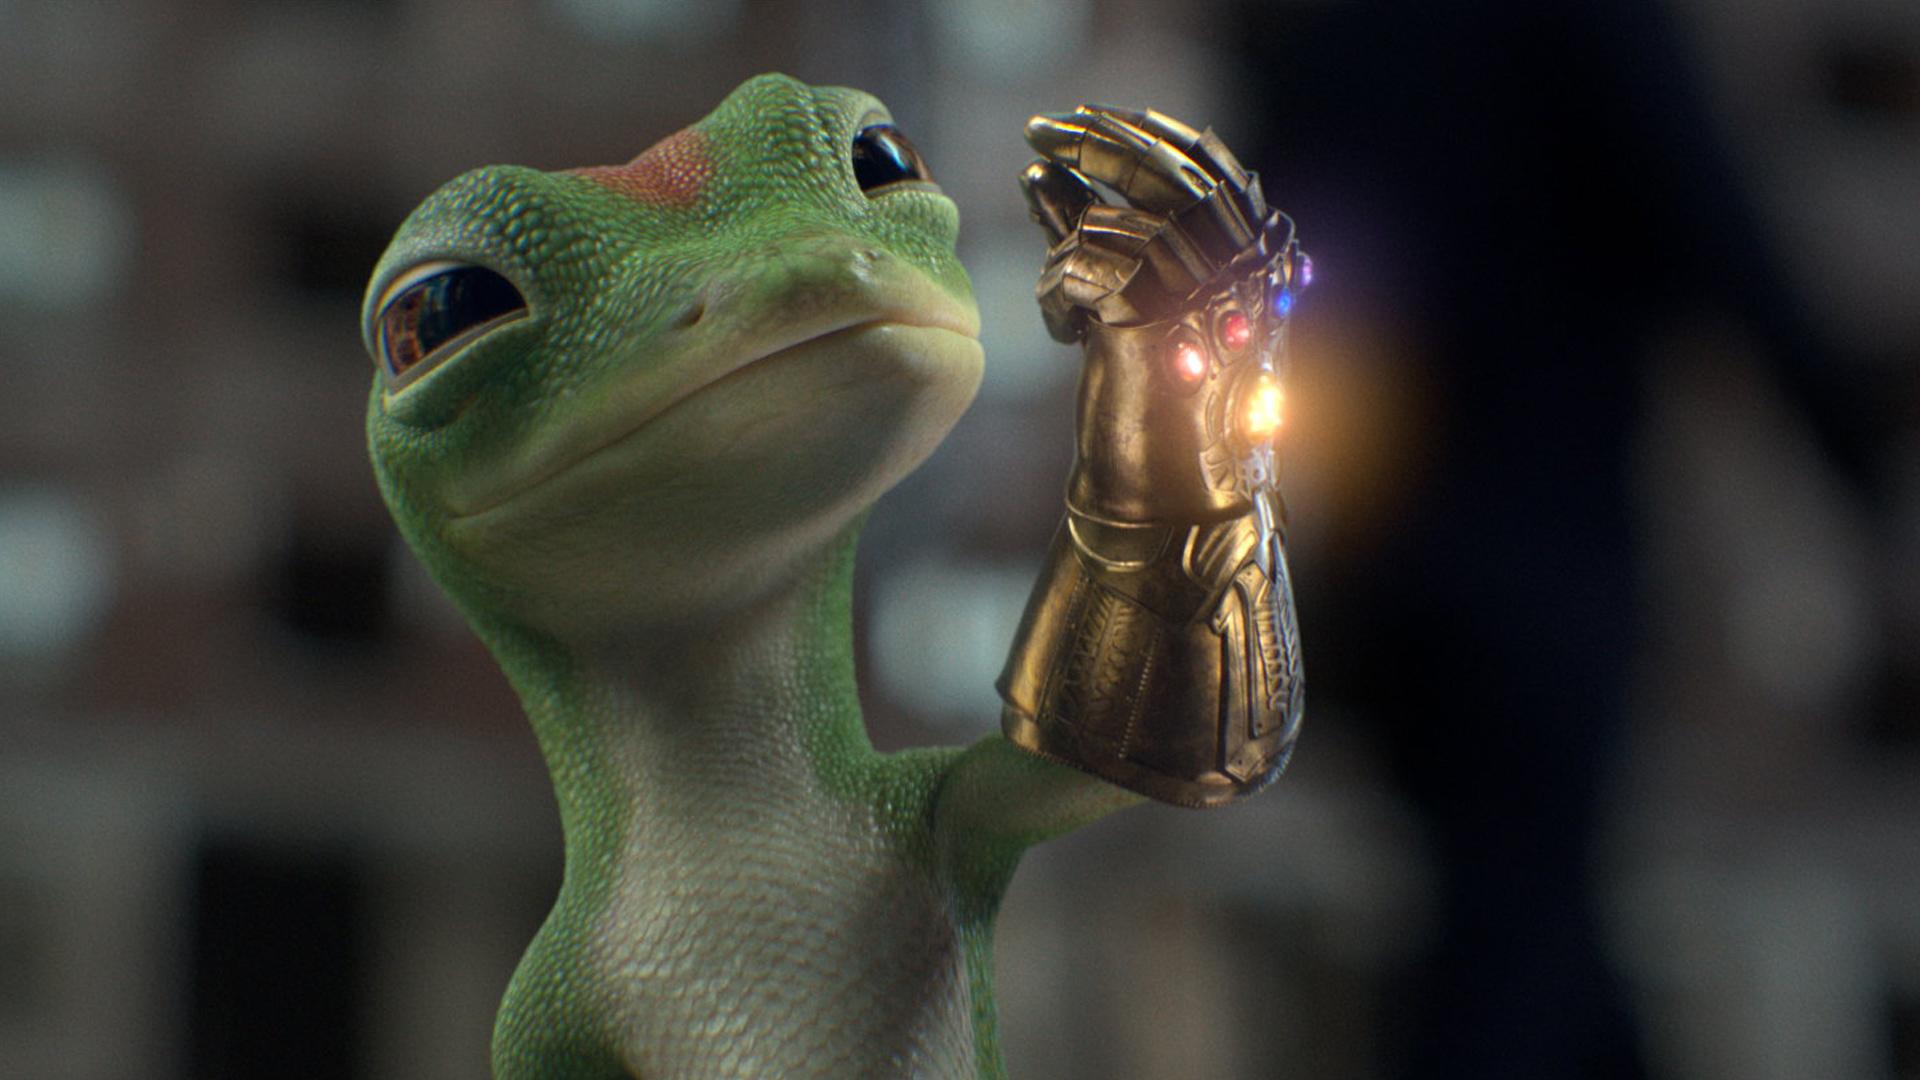 Infinity Gecko